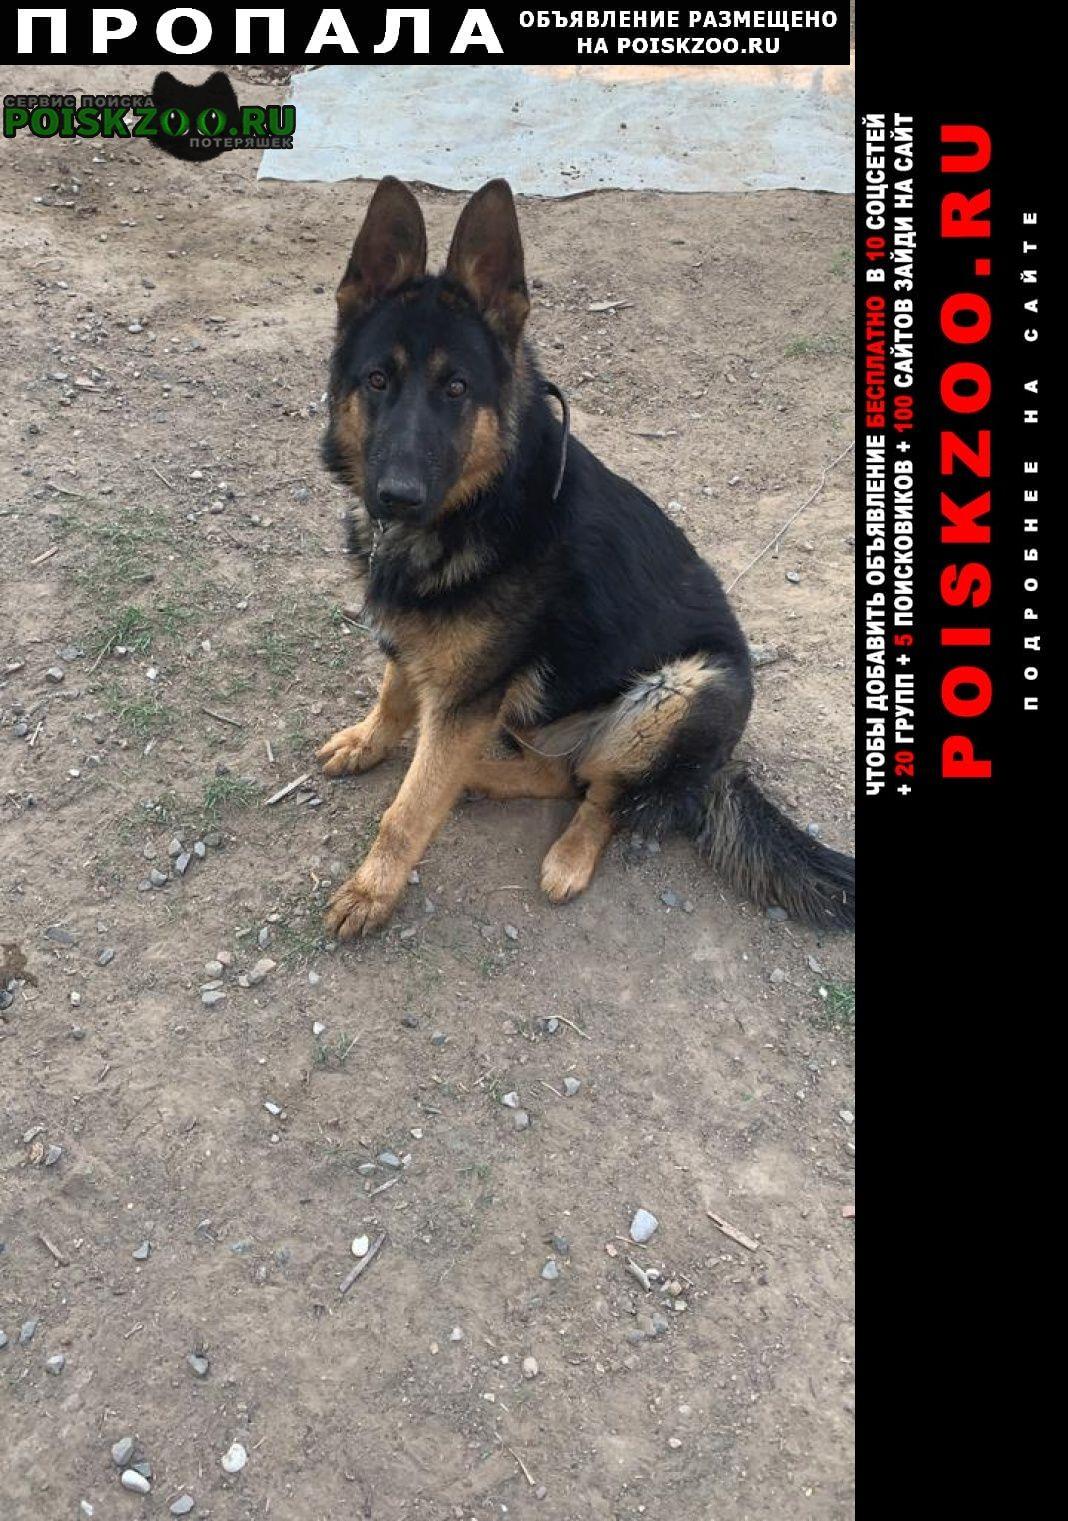 Пропала собака Астрахань